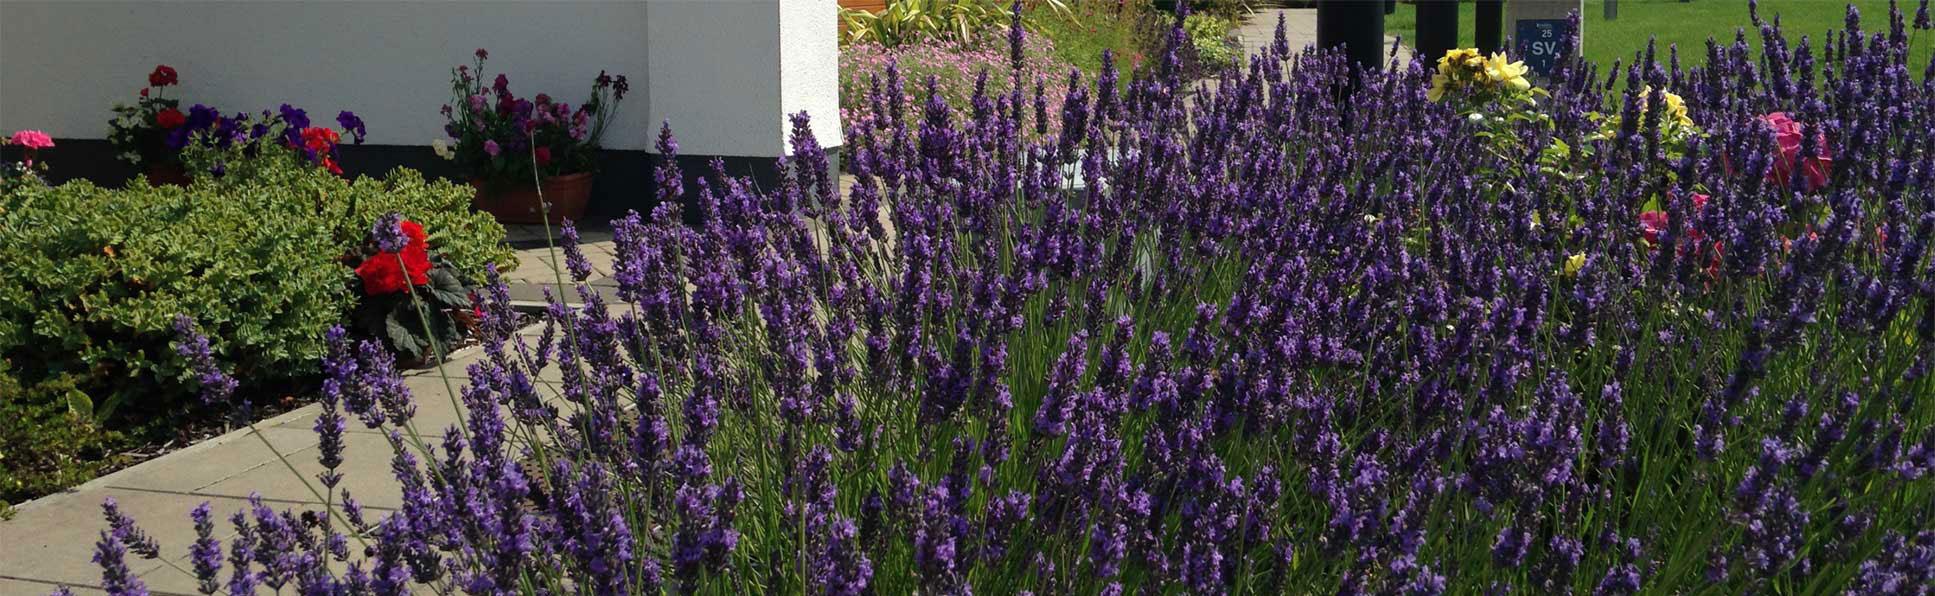 Lavender at Ballymote Community Housing Unit